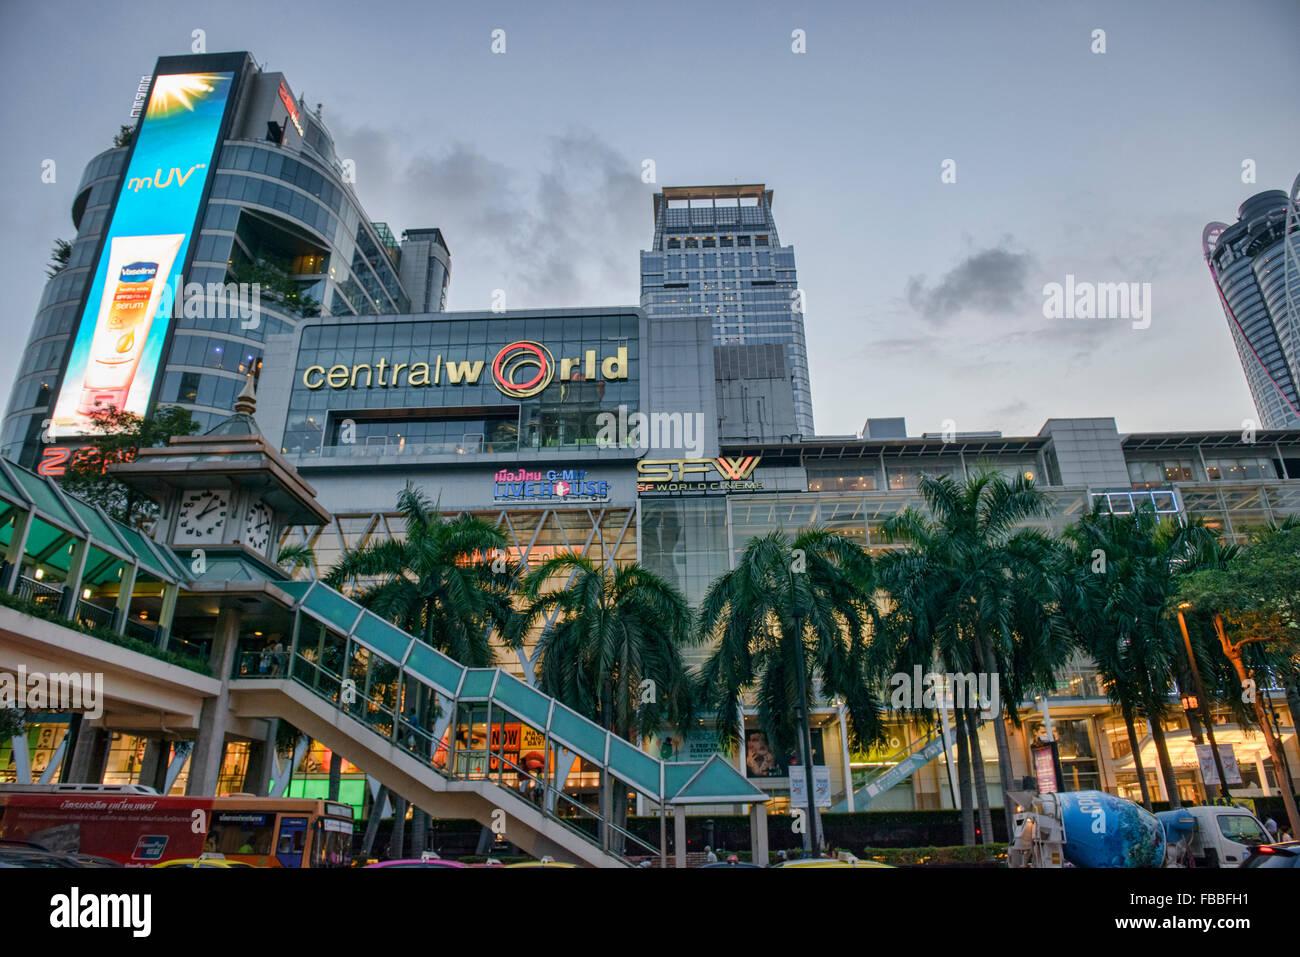 Central World Shopping Mall in Bangkok, Thailand - Stock Image